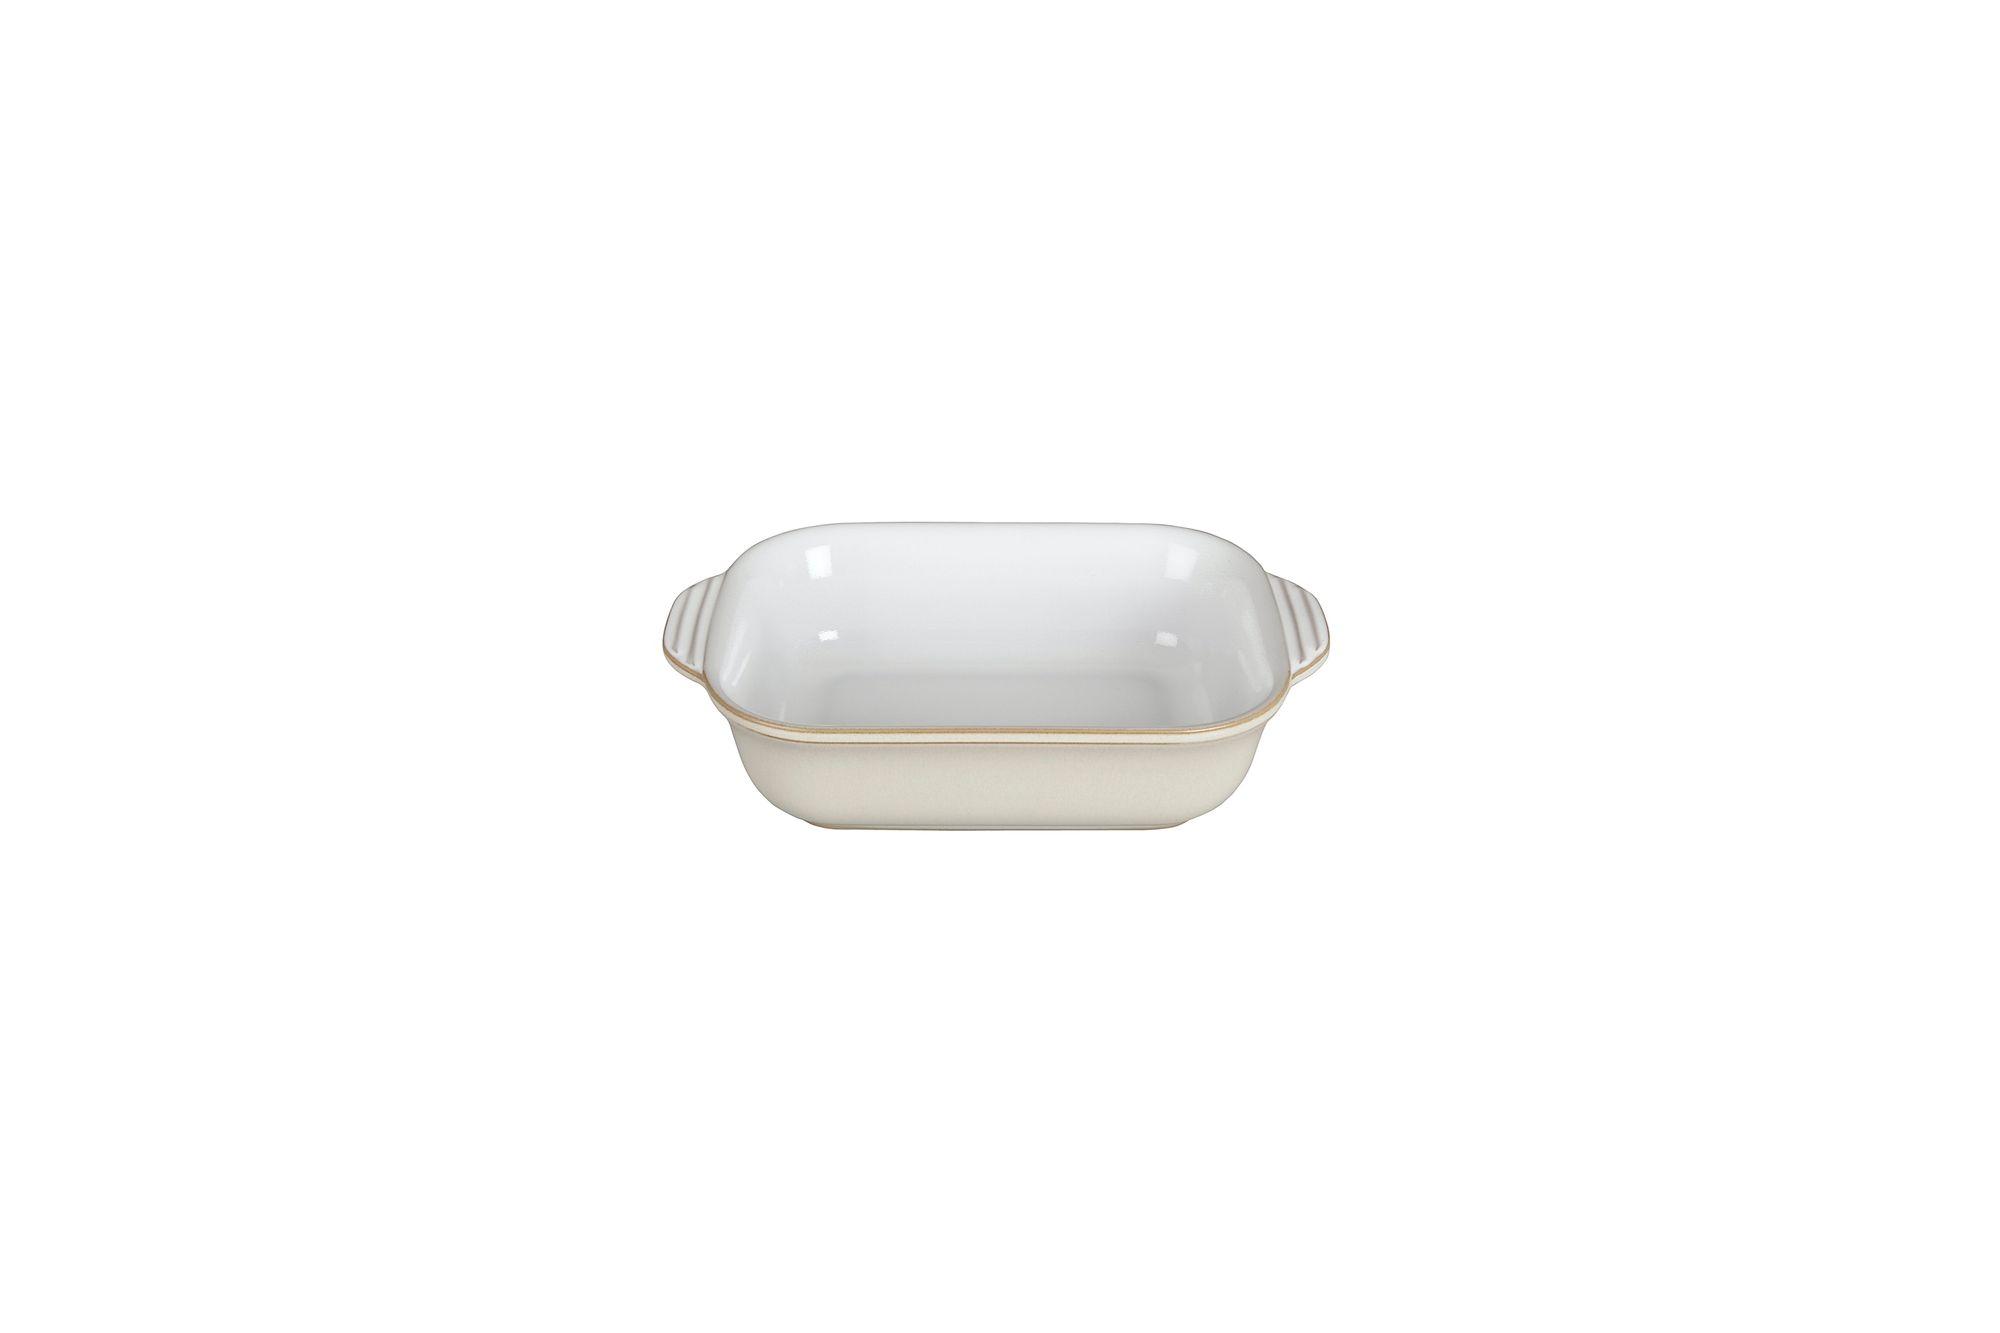 Denby Linen Oven Dish Oblong, Eared, White Inside - Small 21.5 x 13.8 x 5.7cm, 0.5l thumb 2